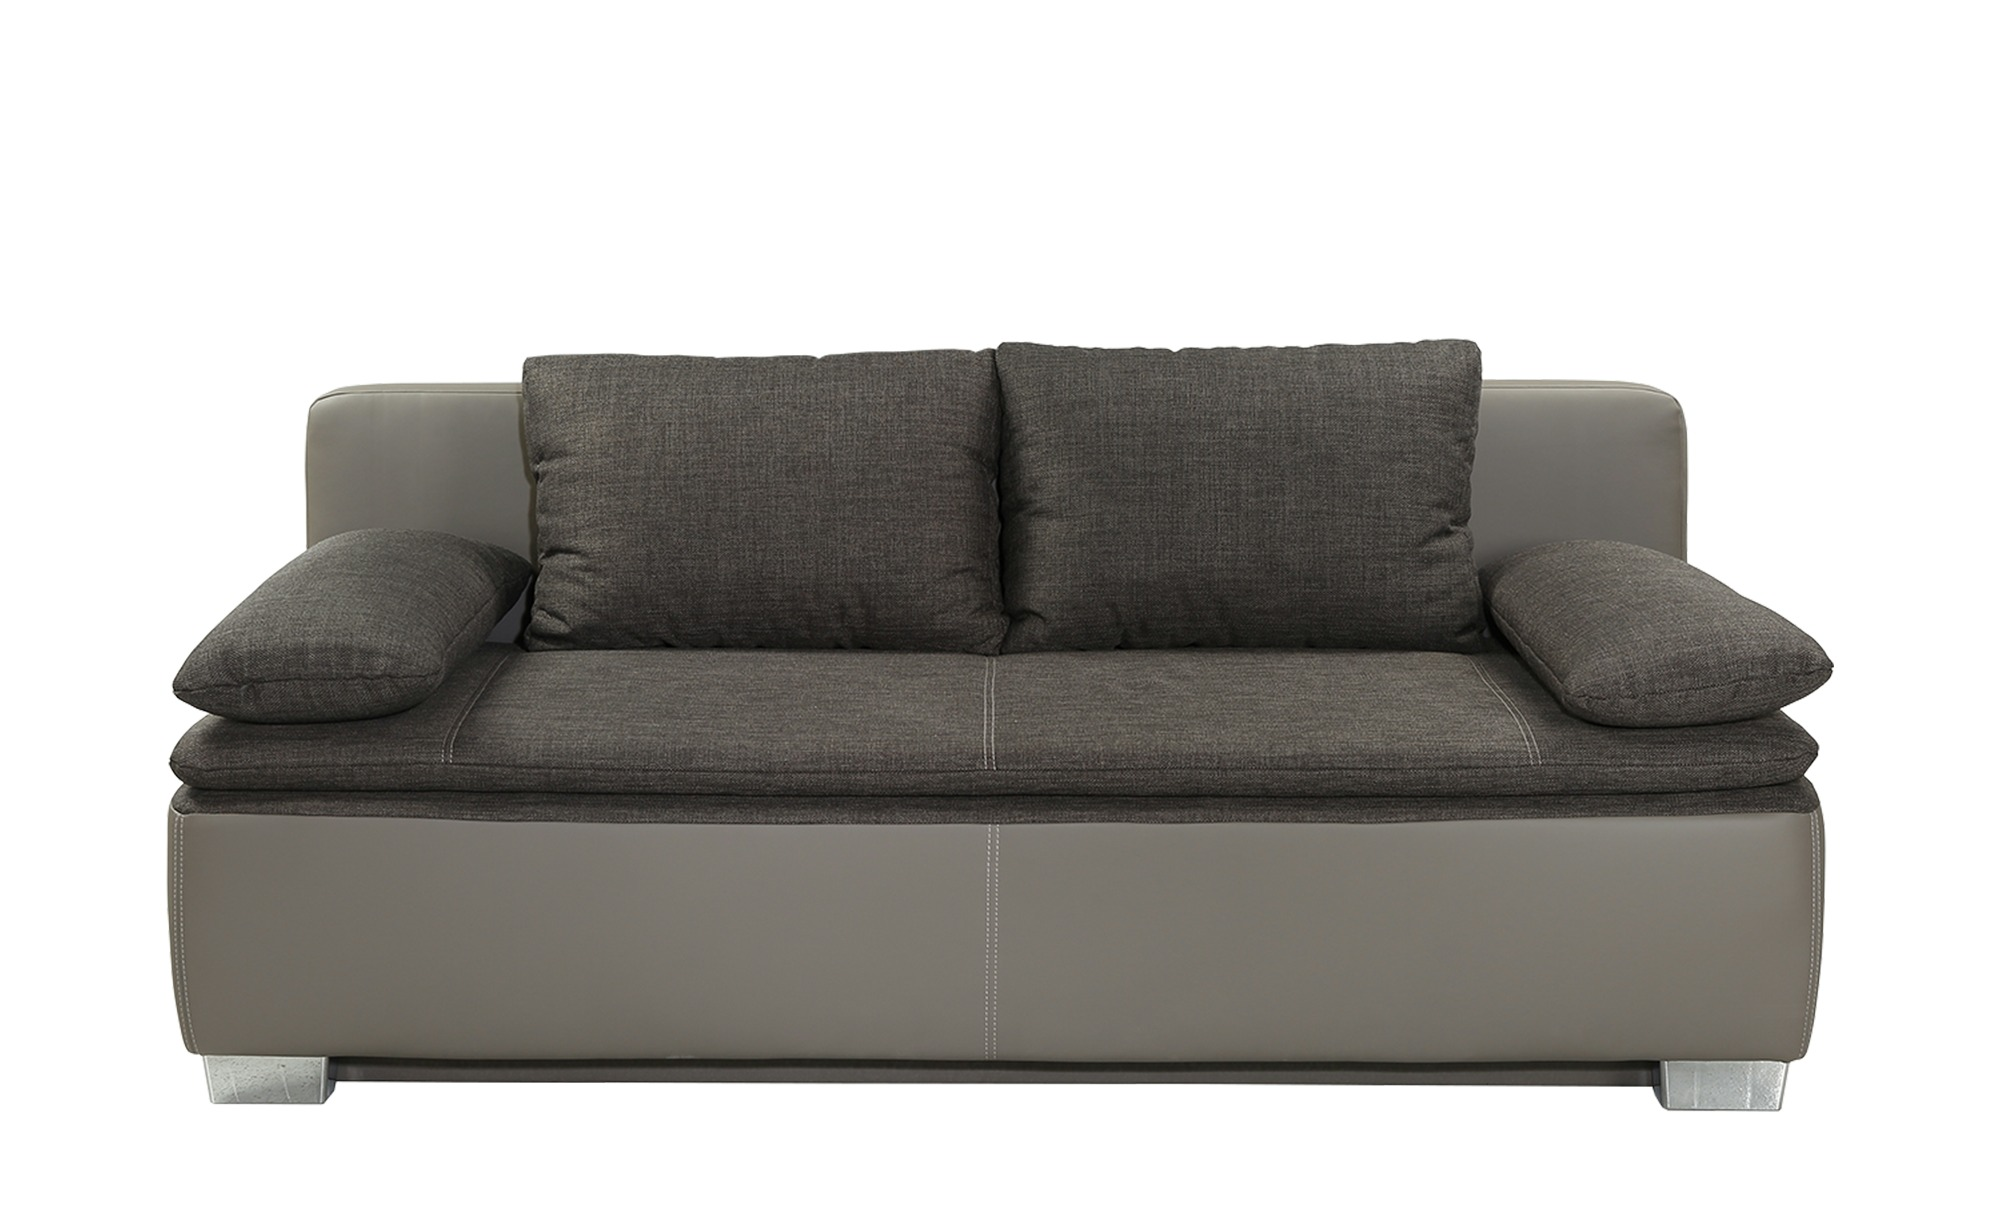 Schlafsofa grau/braun - Kunstleder/Webstoff Ronja ¦ braun ¦ Maße (cm): B: 202 H: 85 T: 96 Polstermöbel > Sofas > 2-Sitzer - Höffner